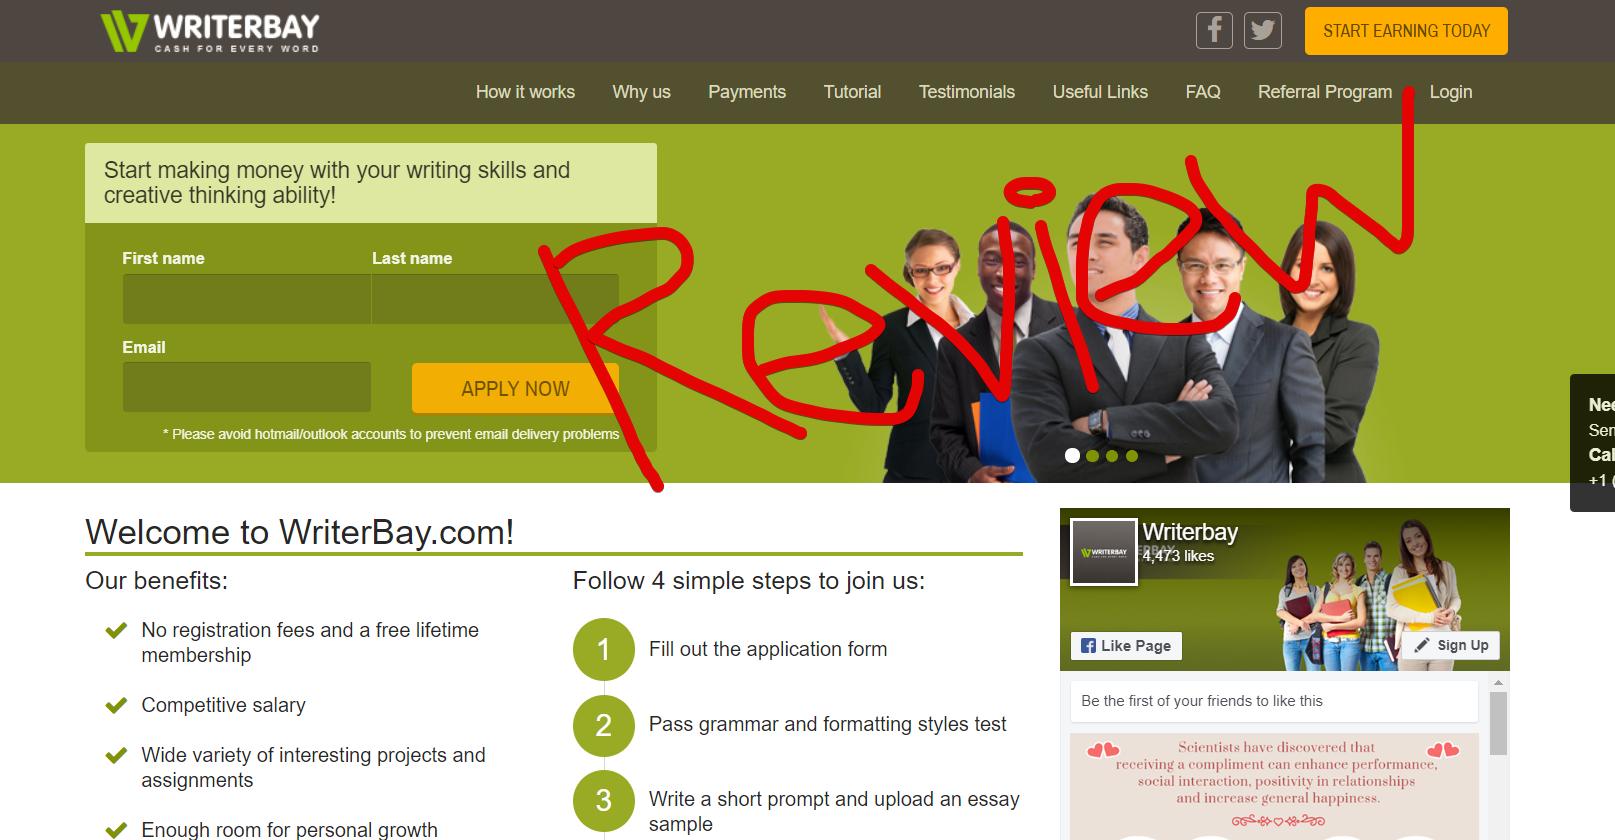 WriterBay Website